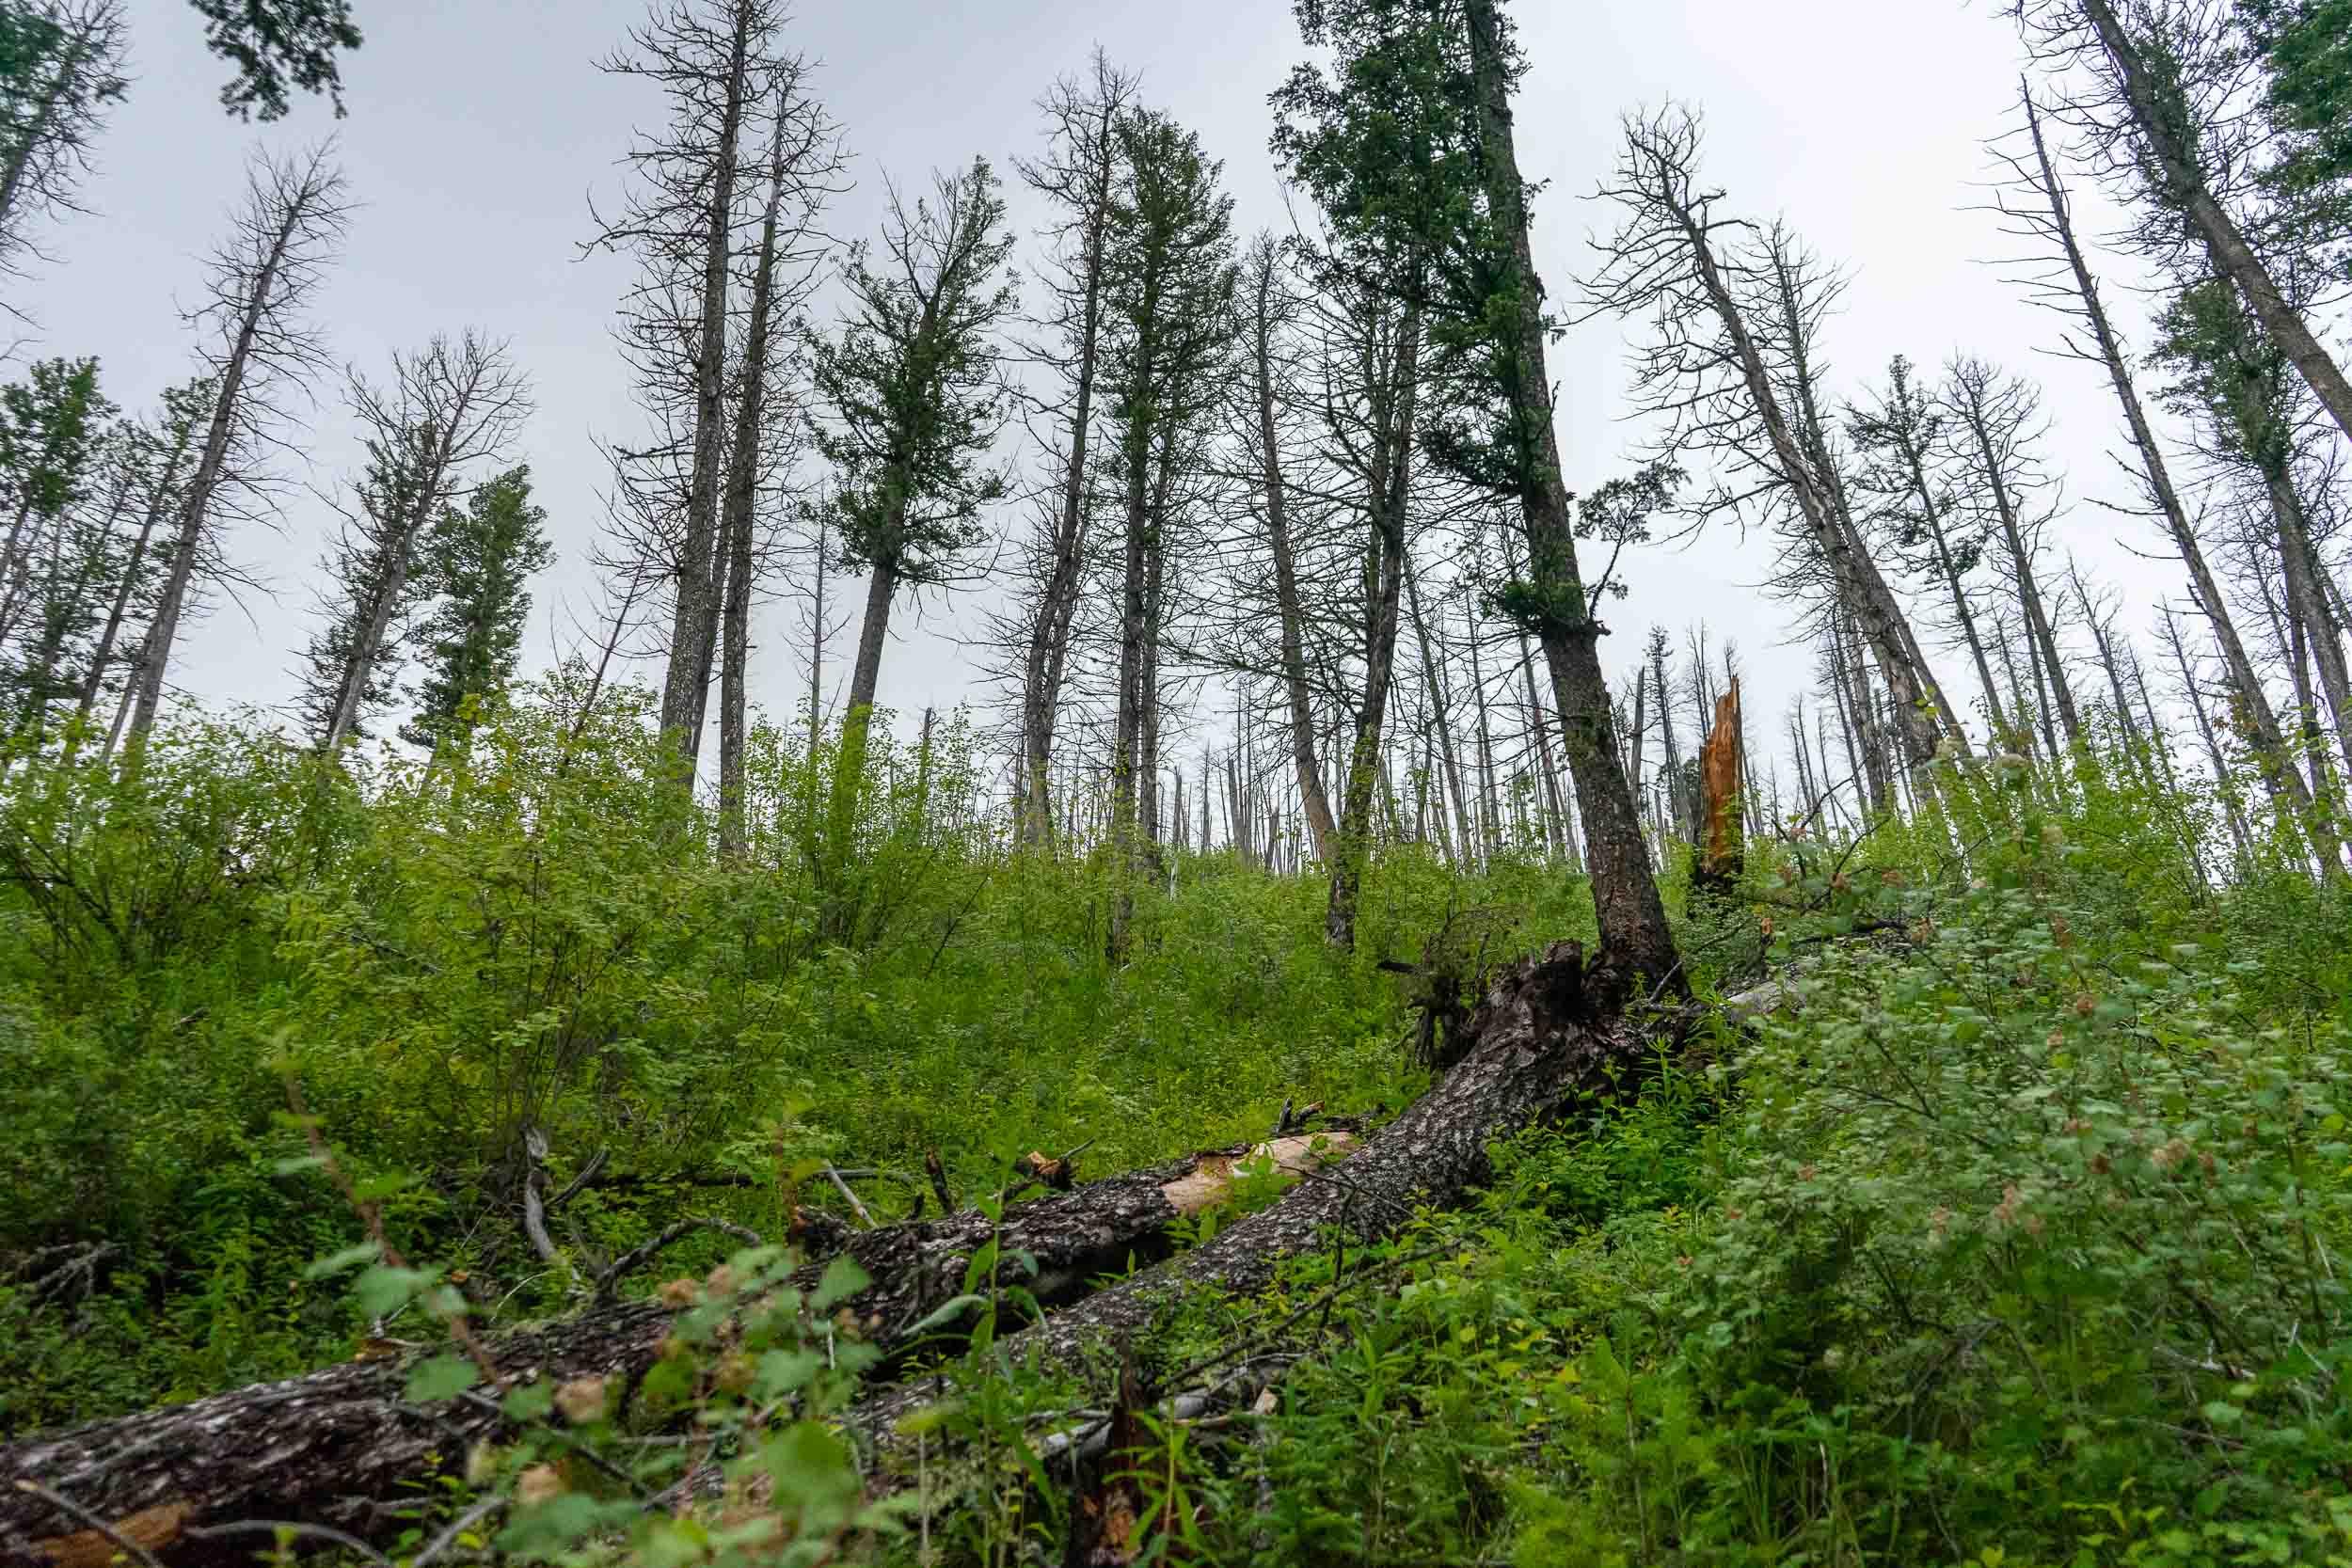 Deer Creek Cabin forest service cabin near Big Timber, Montana